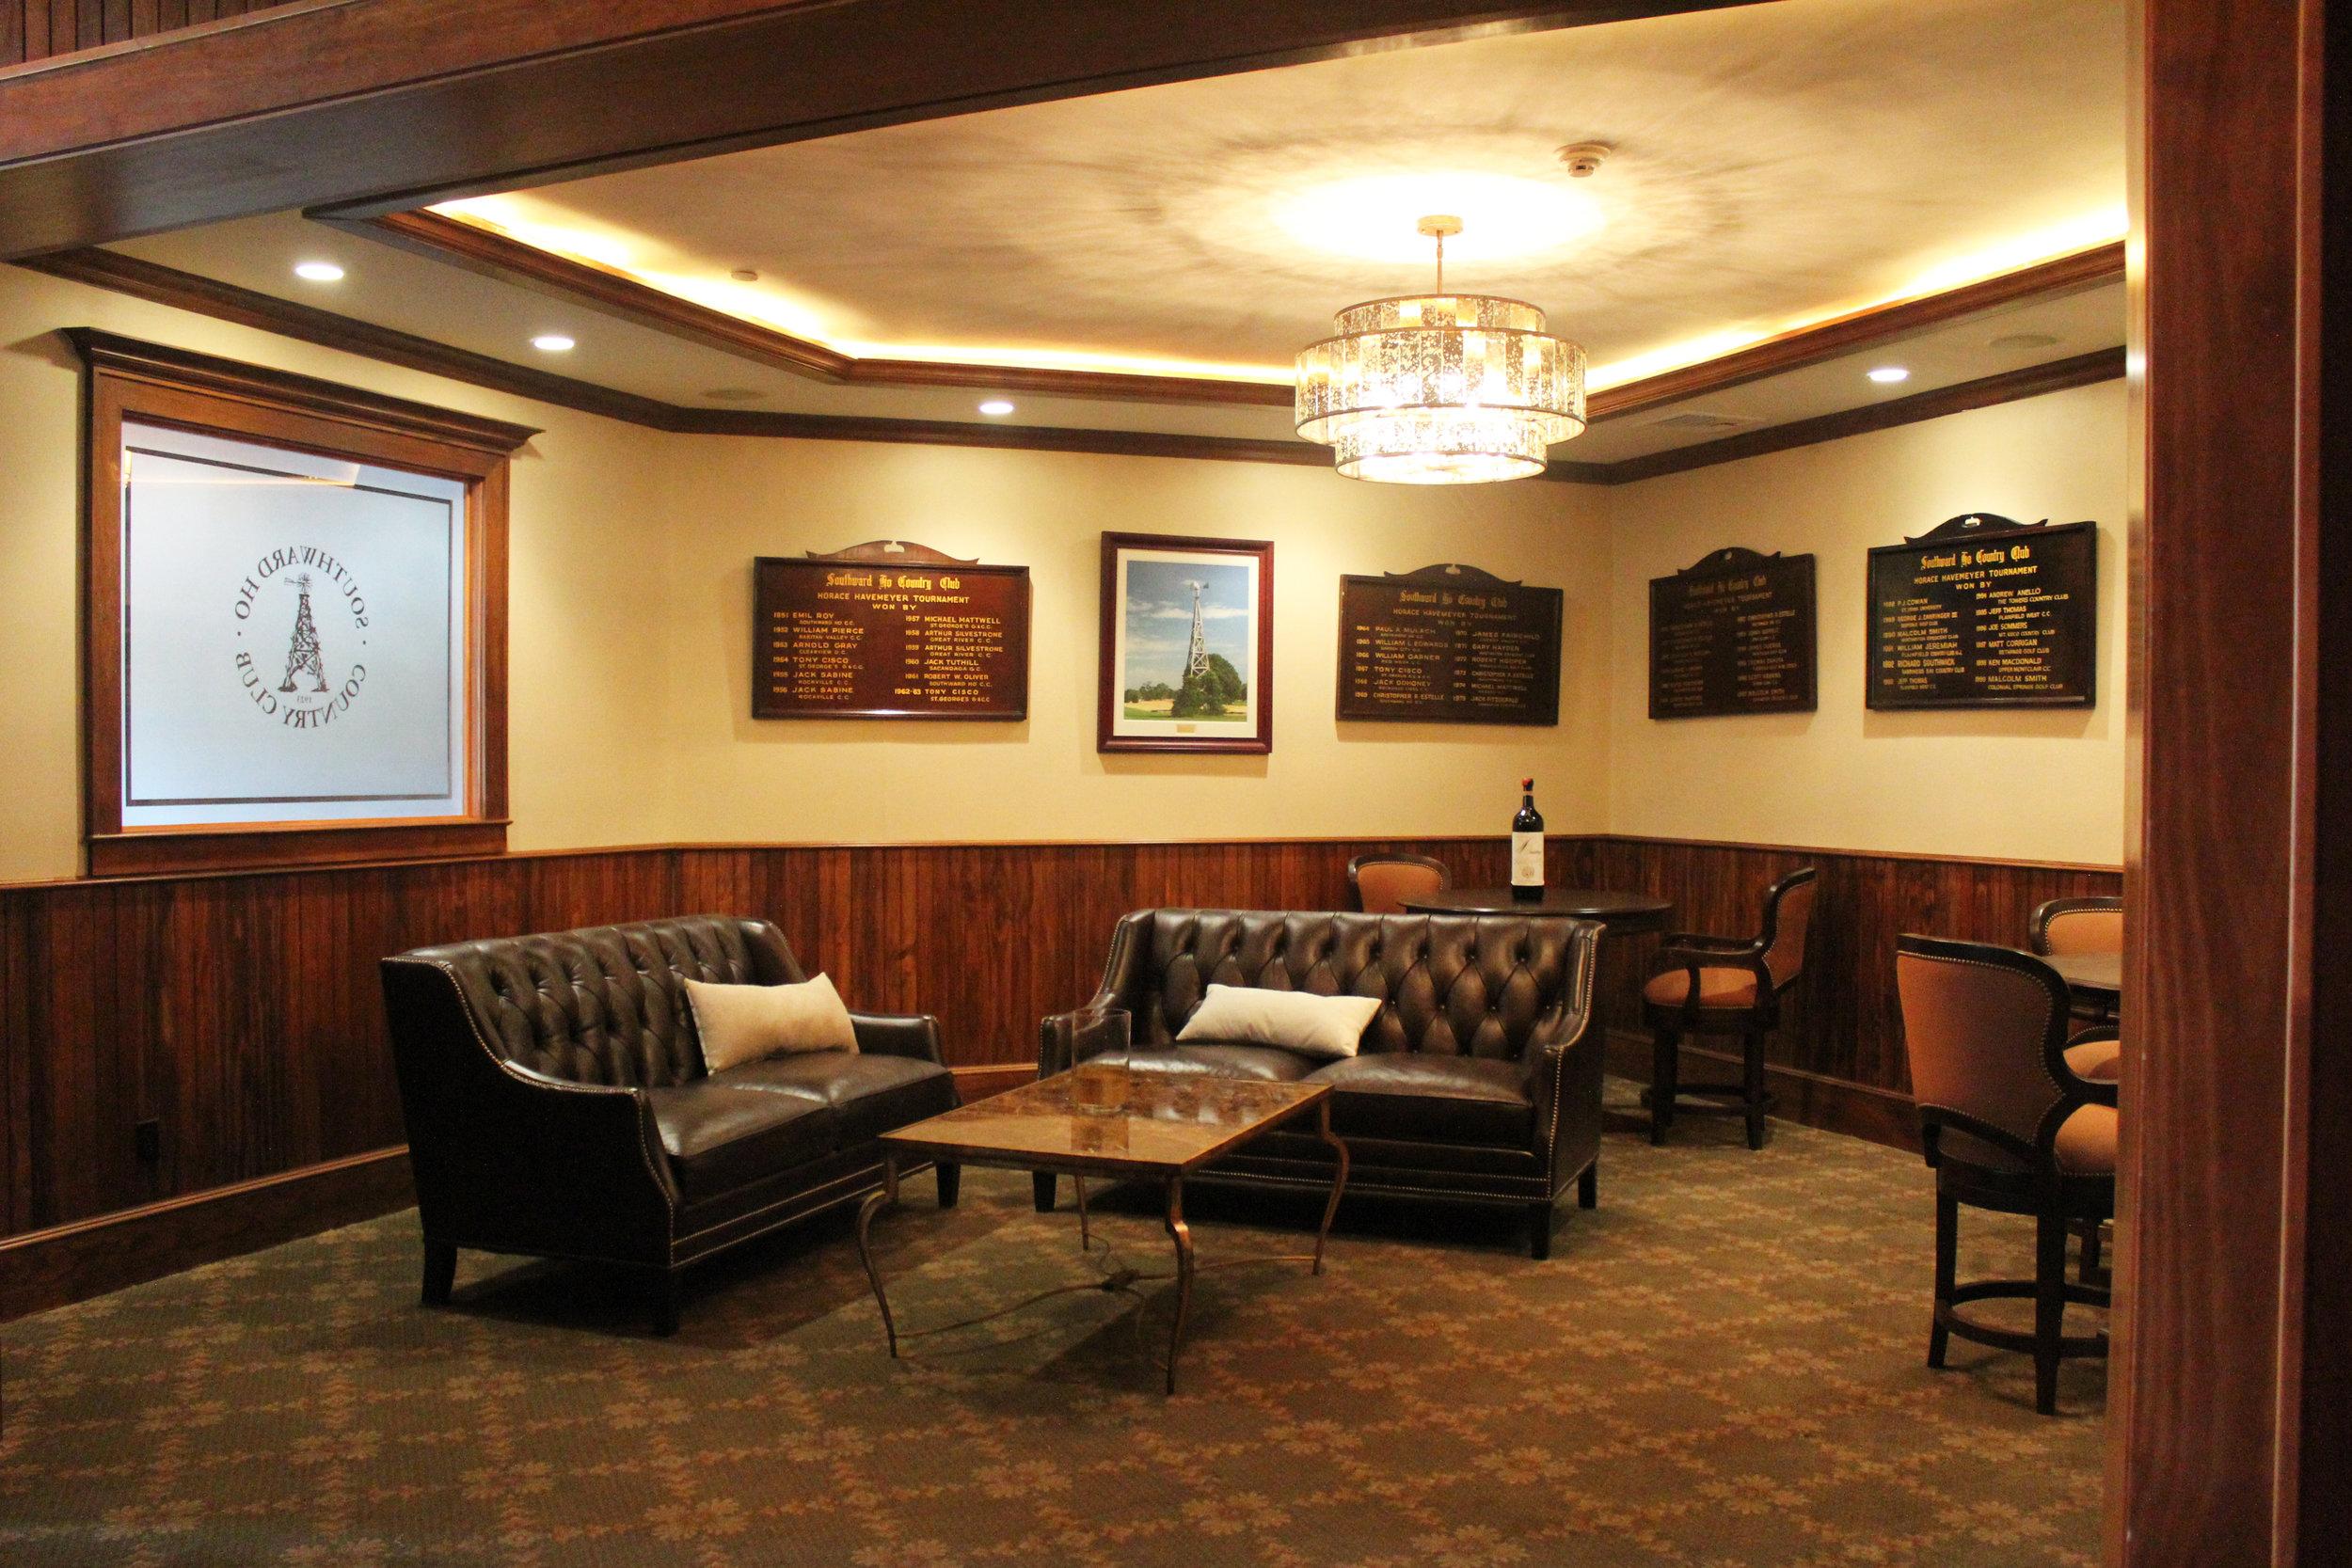 05 Interior - Sitting Room.JPG